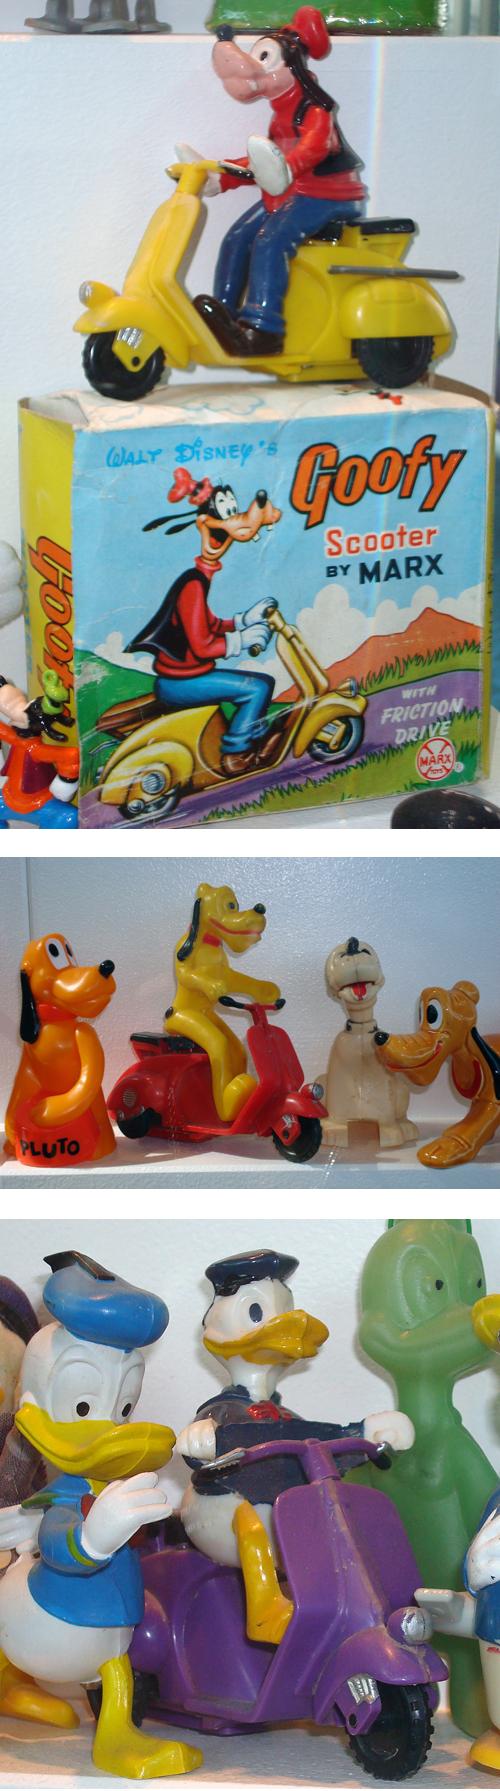 Disney Marx Scooter Vespa Collection Goofy Pluto Donald Duck